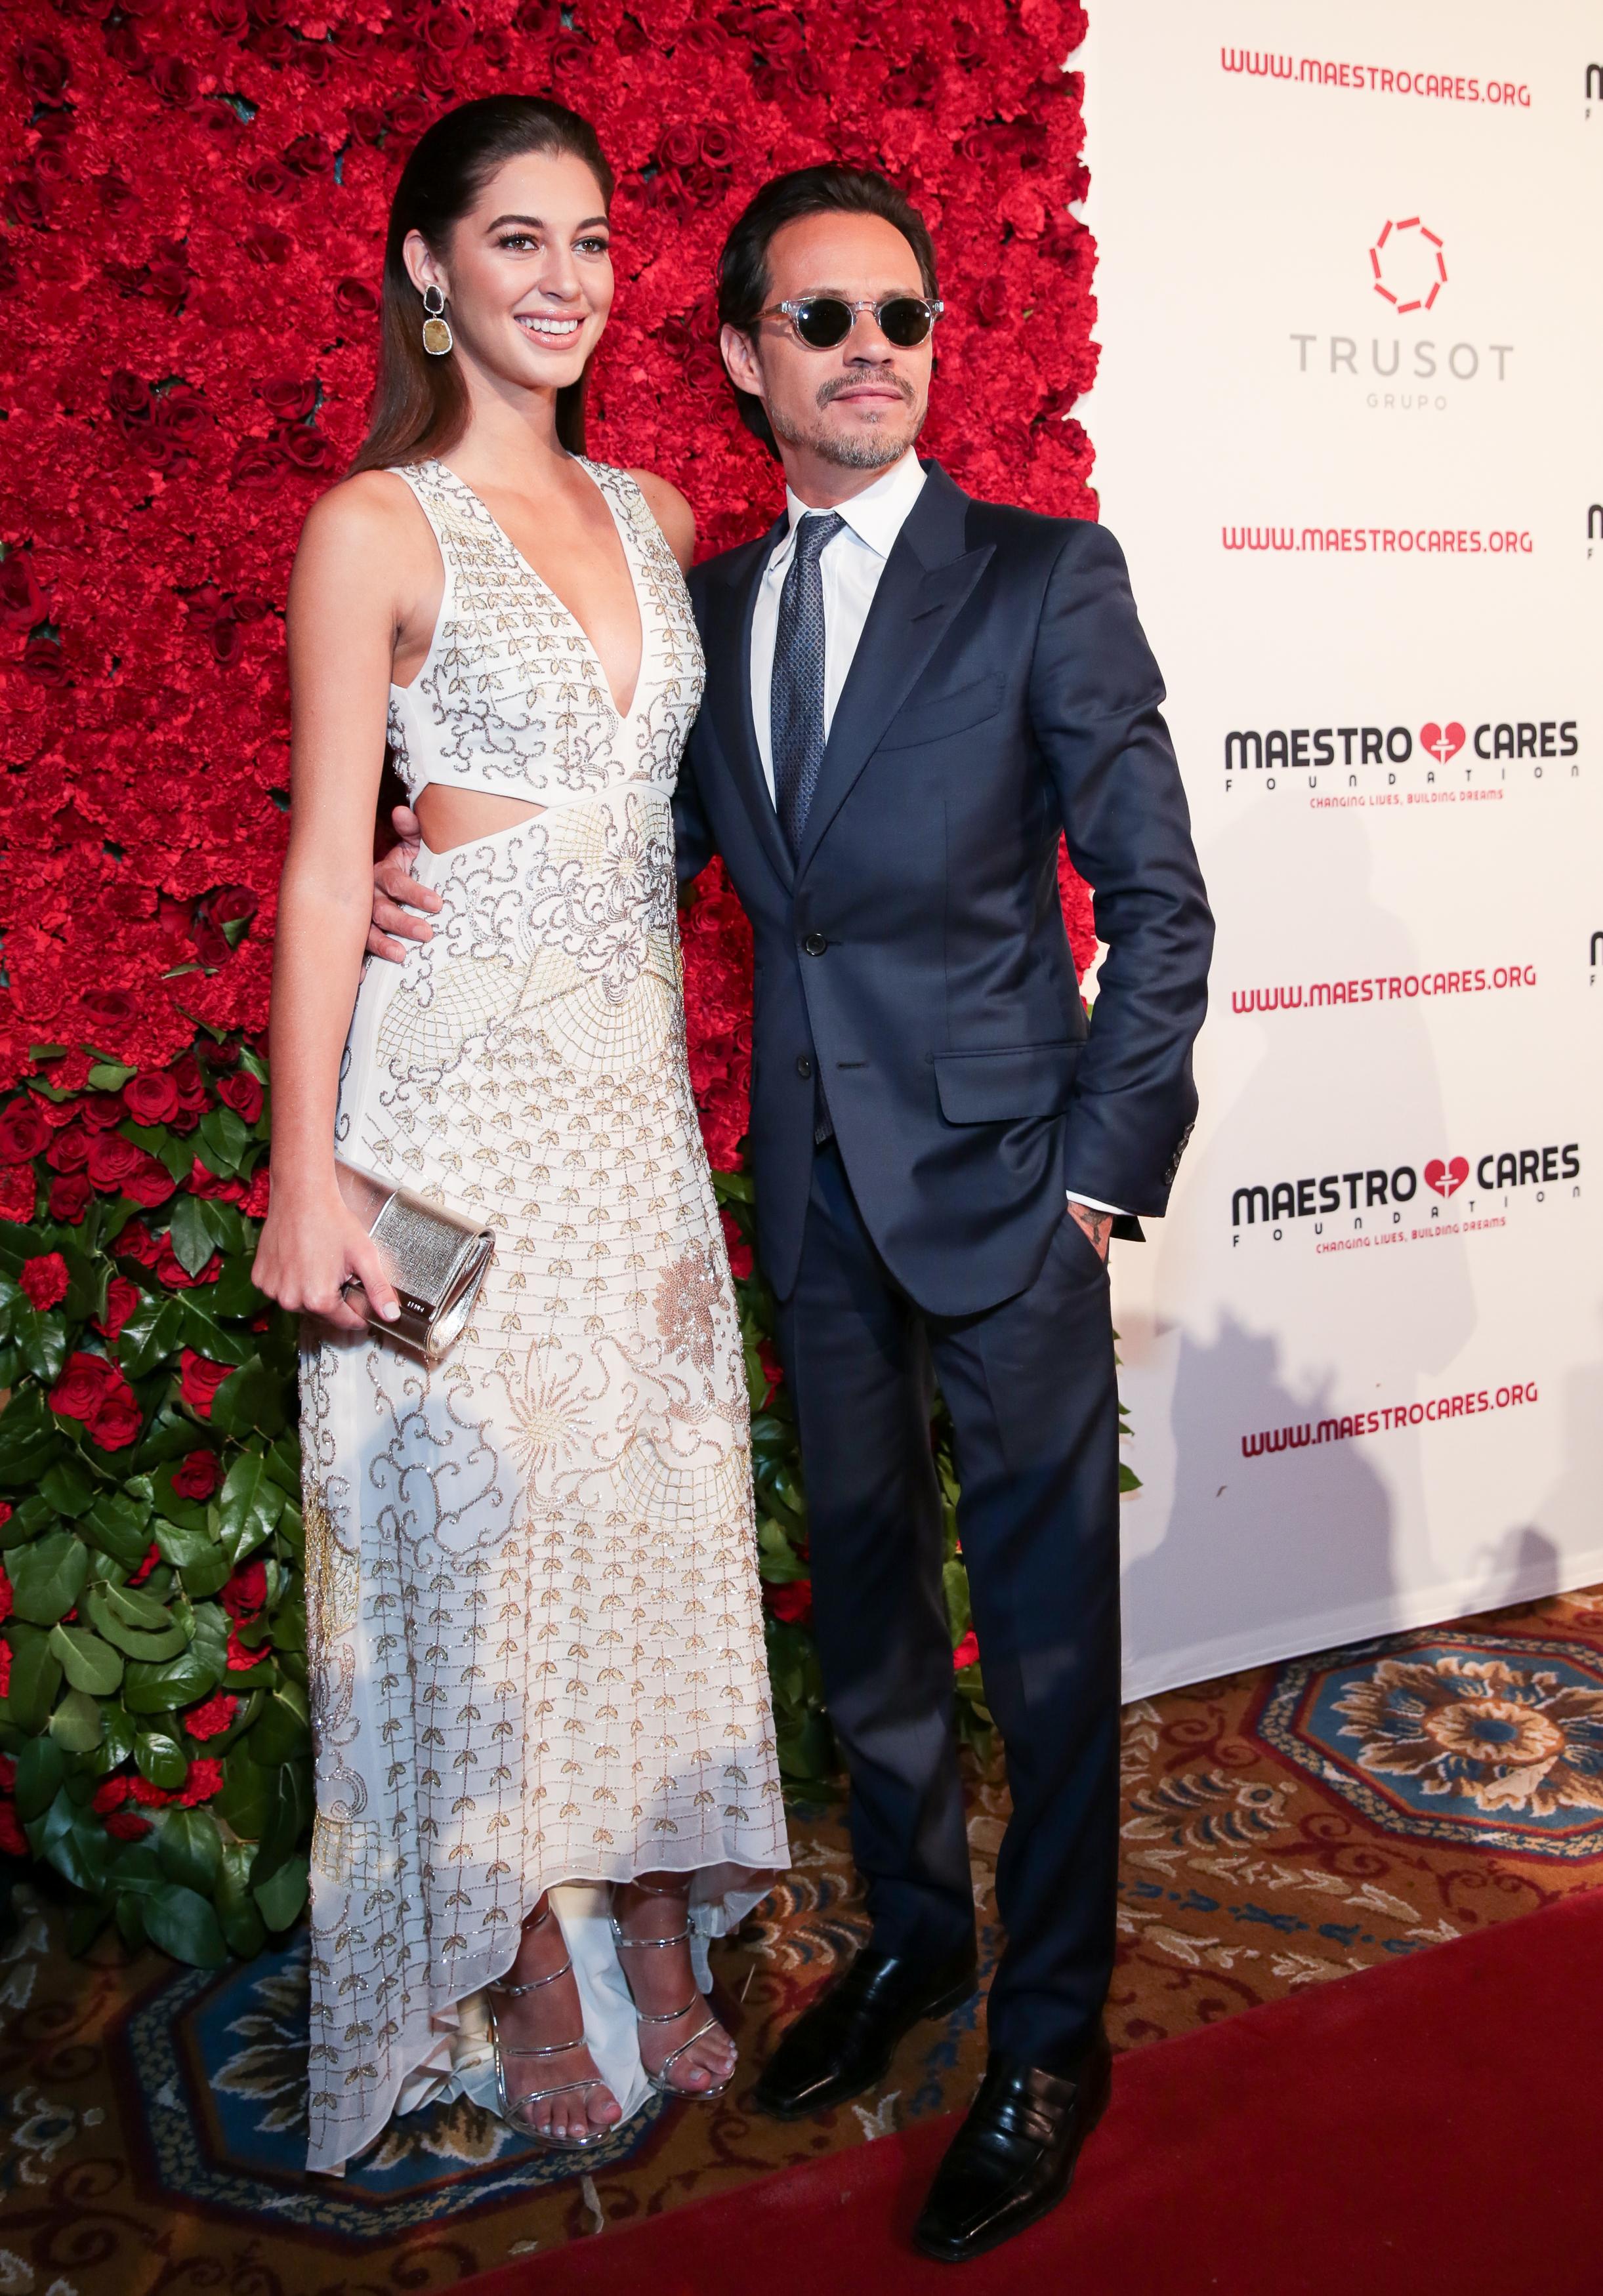 Mariana Downing and Marc Anthony